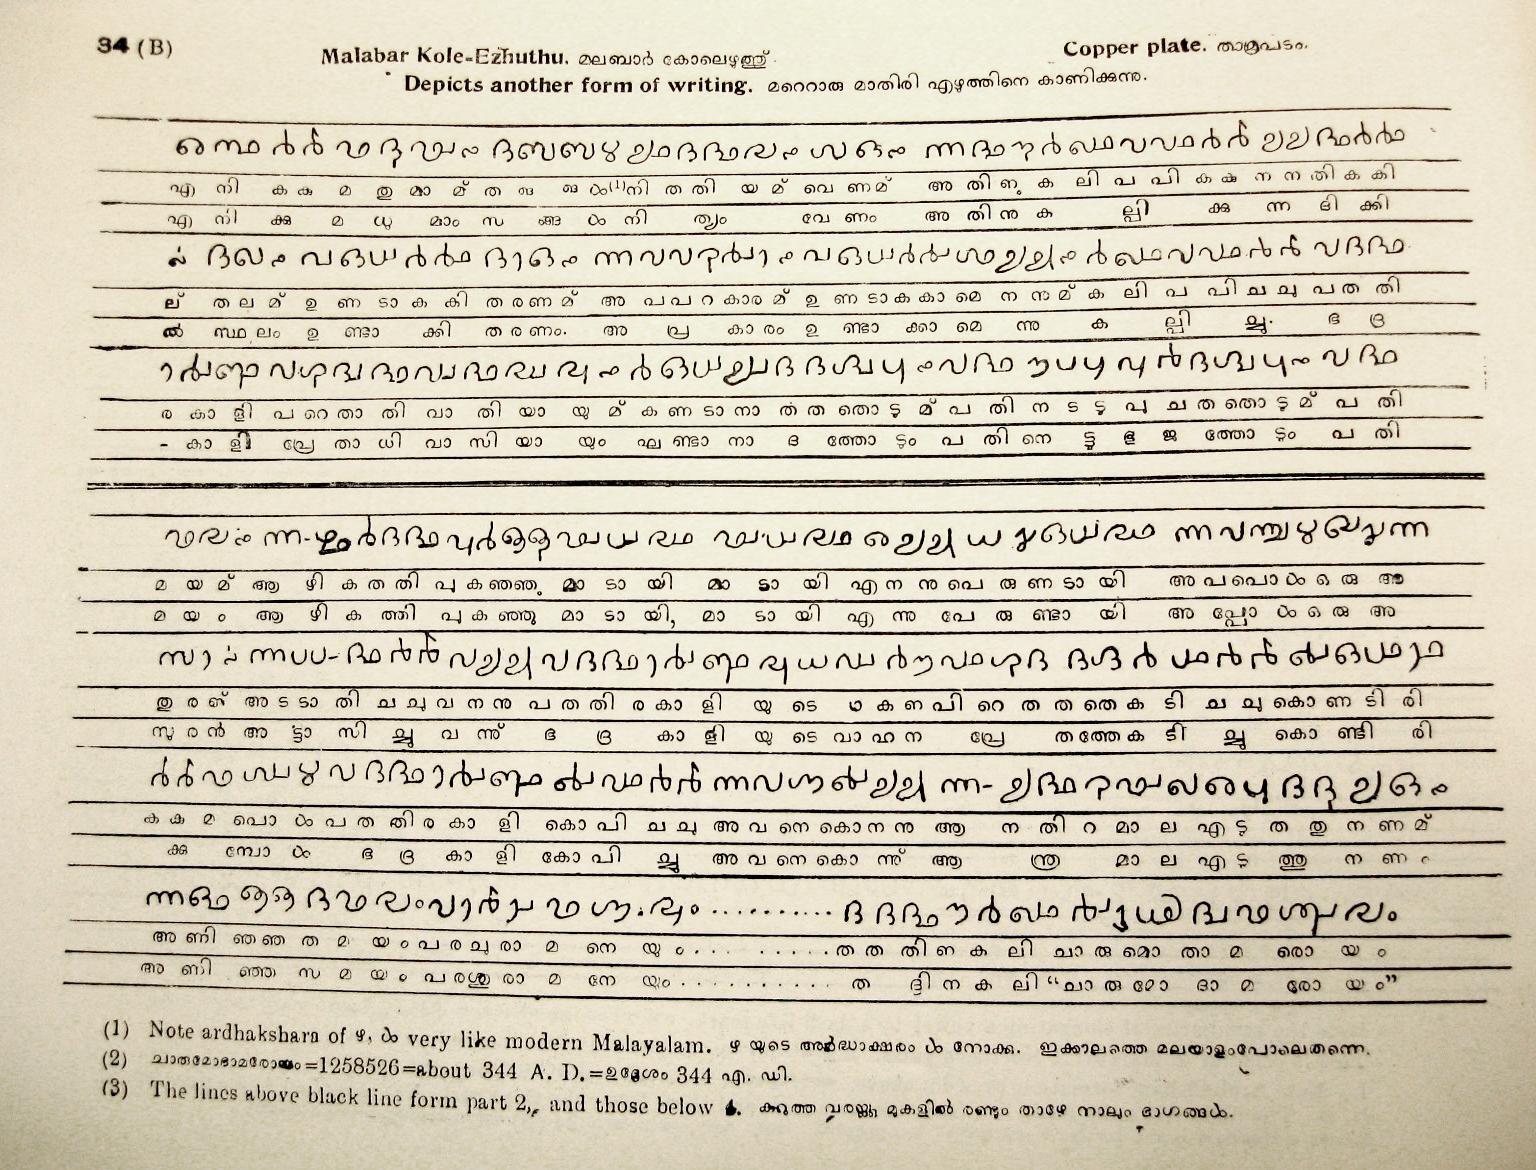 Kole-Ezhuthu manuscript